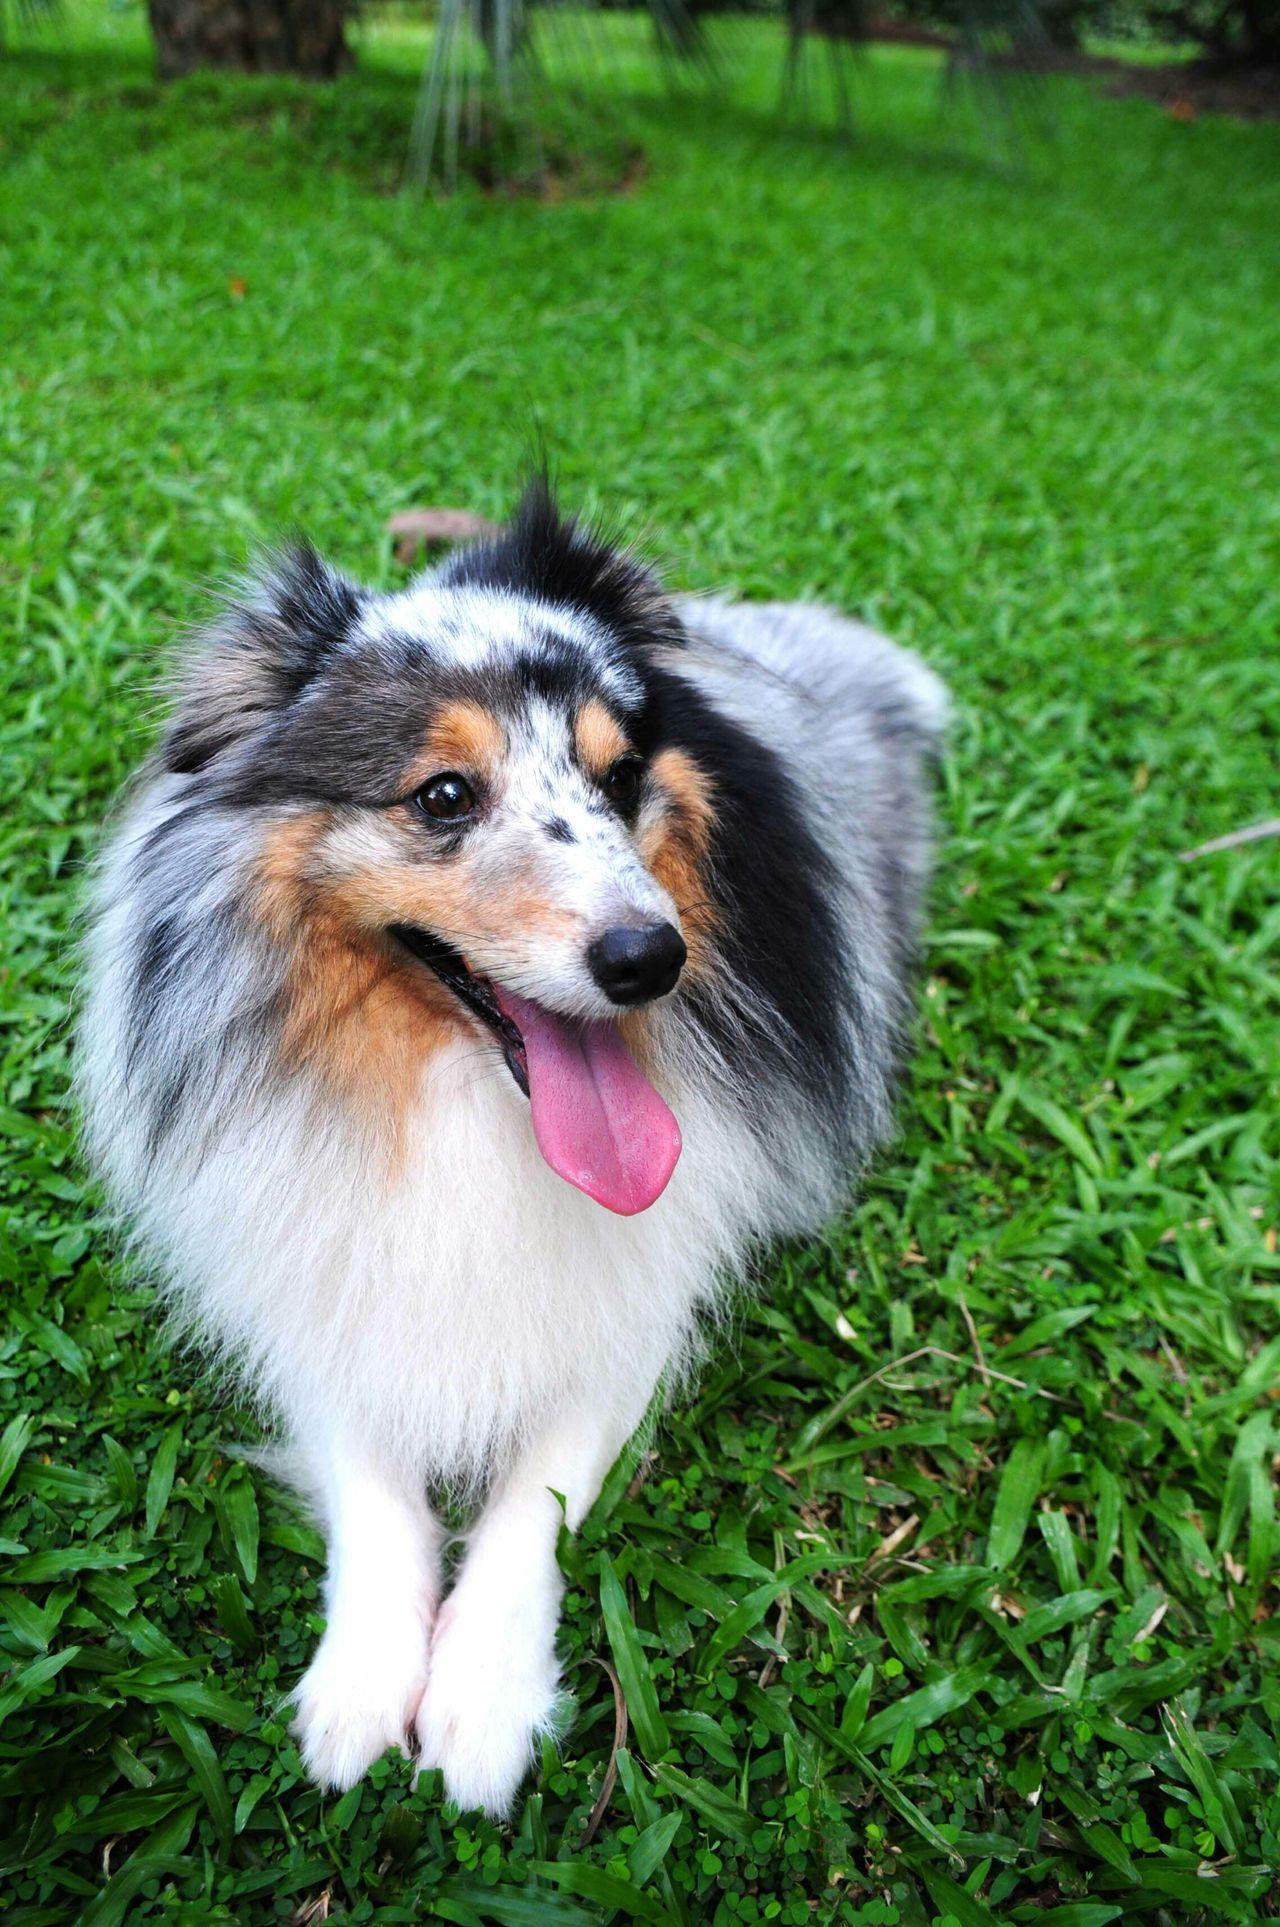 I Love My Dog Dog Dog Love Pet Pet Photography  Pets Corner Pets The Portraitist - 2015 EyeEm Awards Shetland Sheepdog Blue Merle